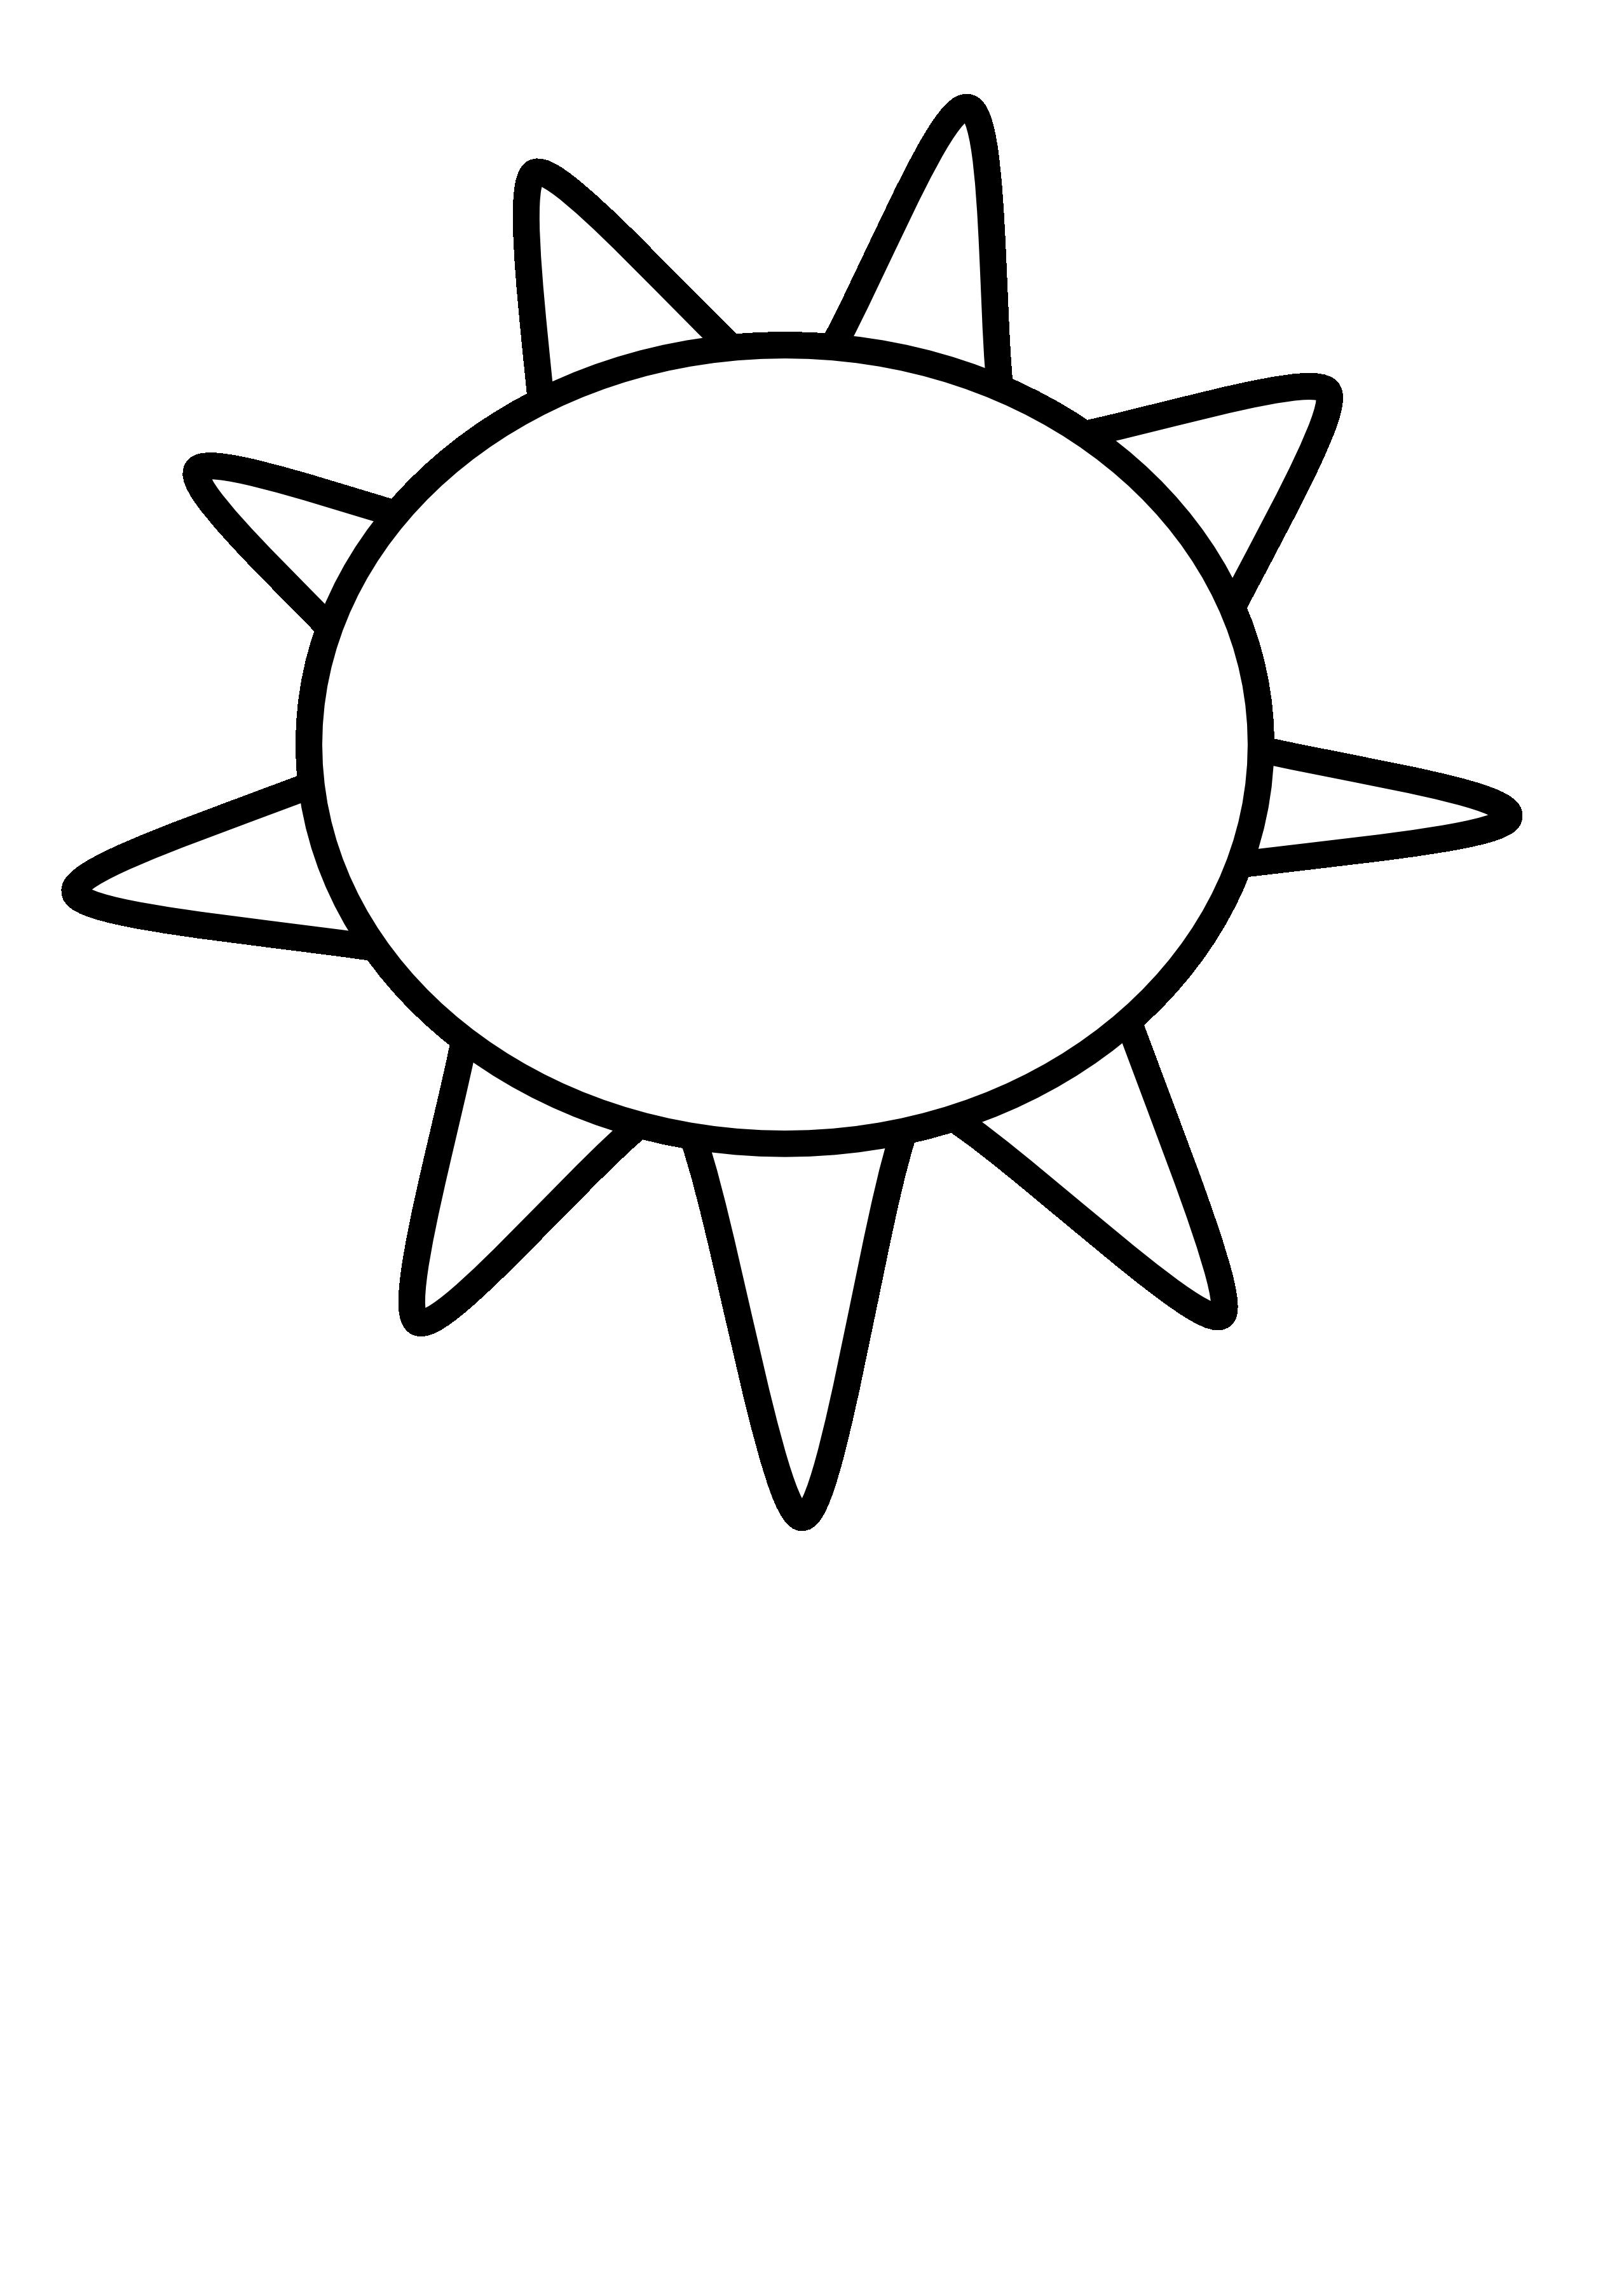 Heat clipart matahari Clipart Sun And Images Panda